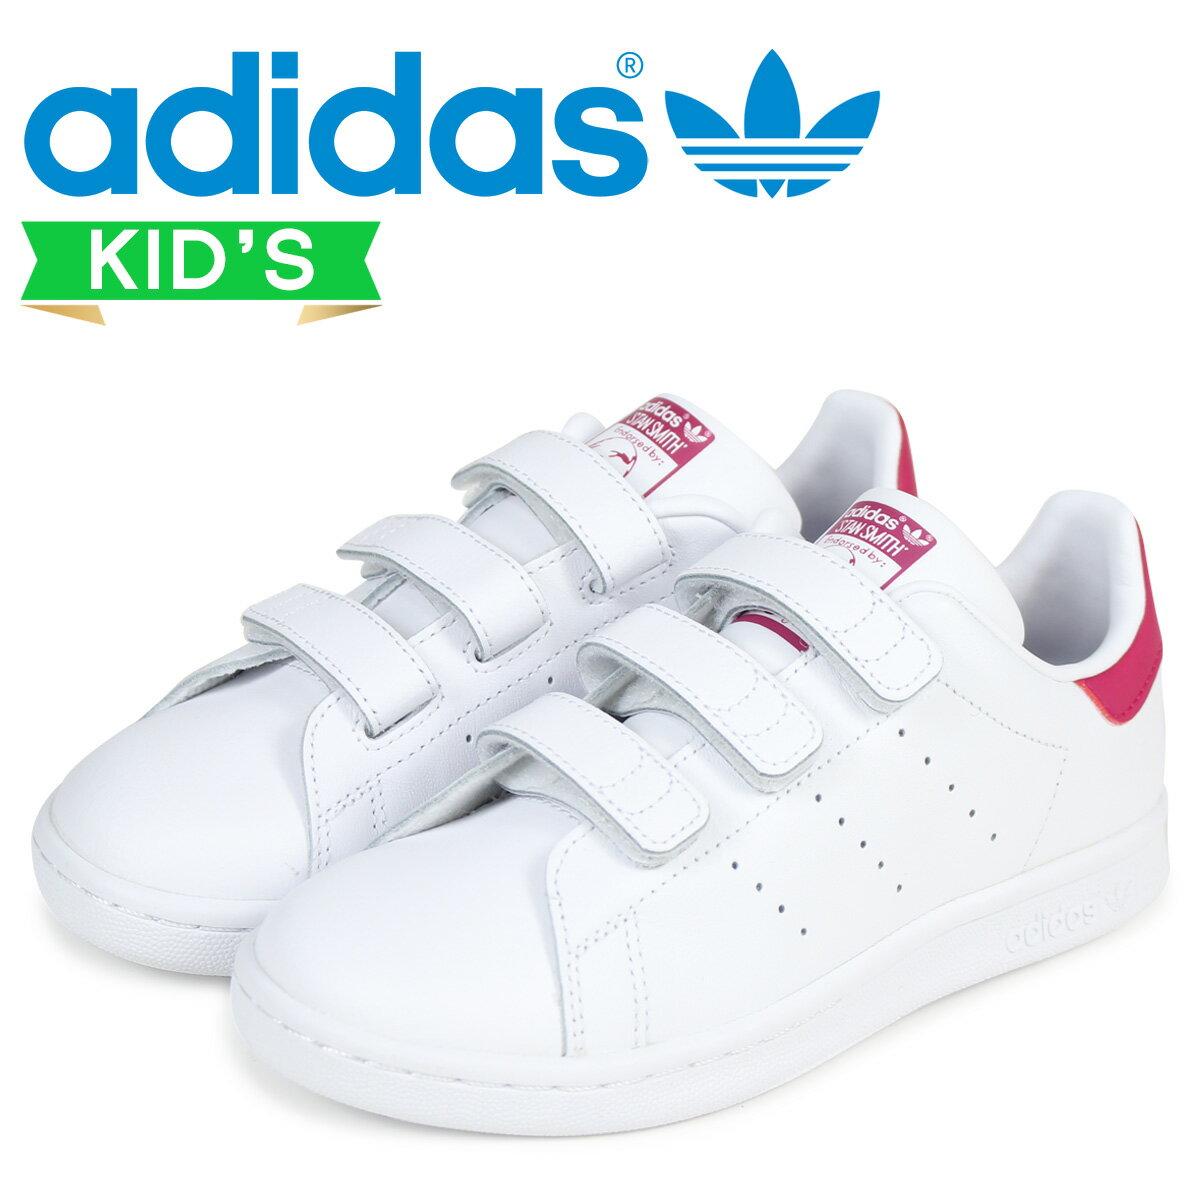 adidas Originals スタンスミス キッズ アディダス スニーカー STAN SMITH CF C B32706 靴 ホワイト